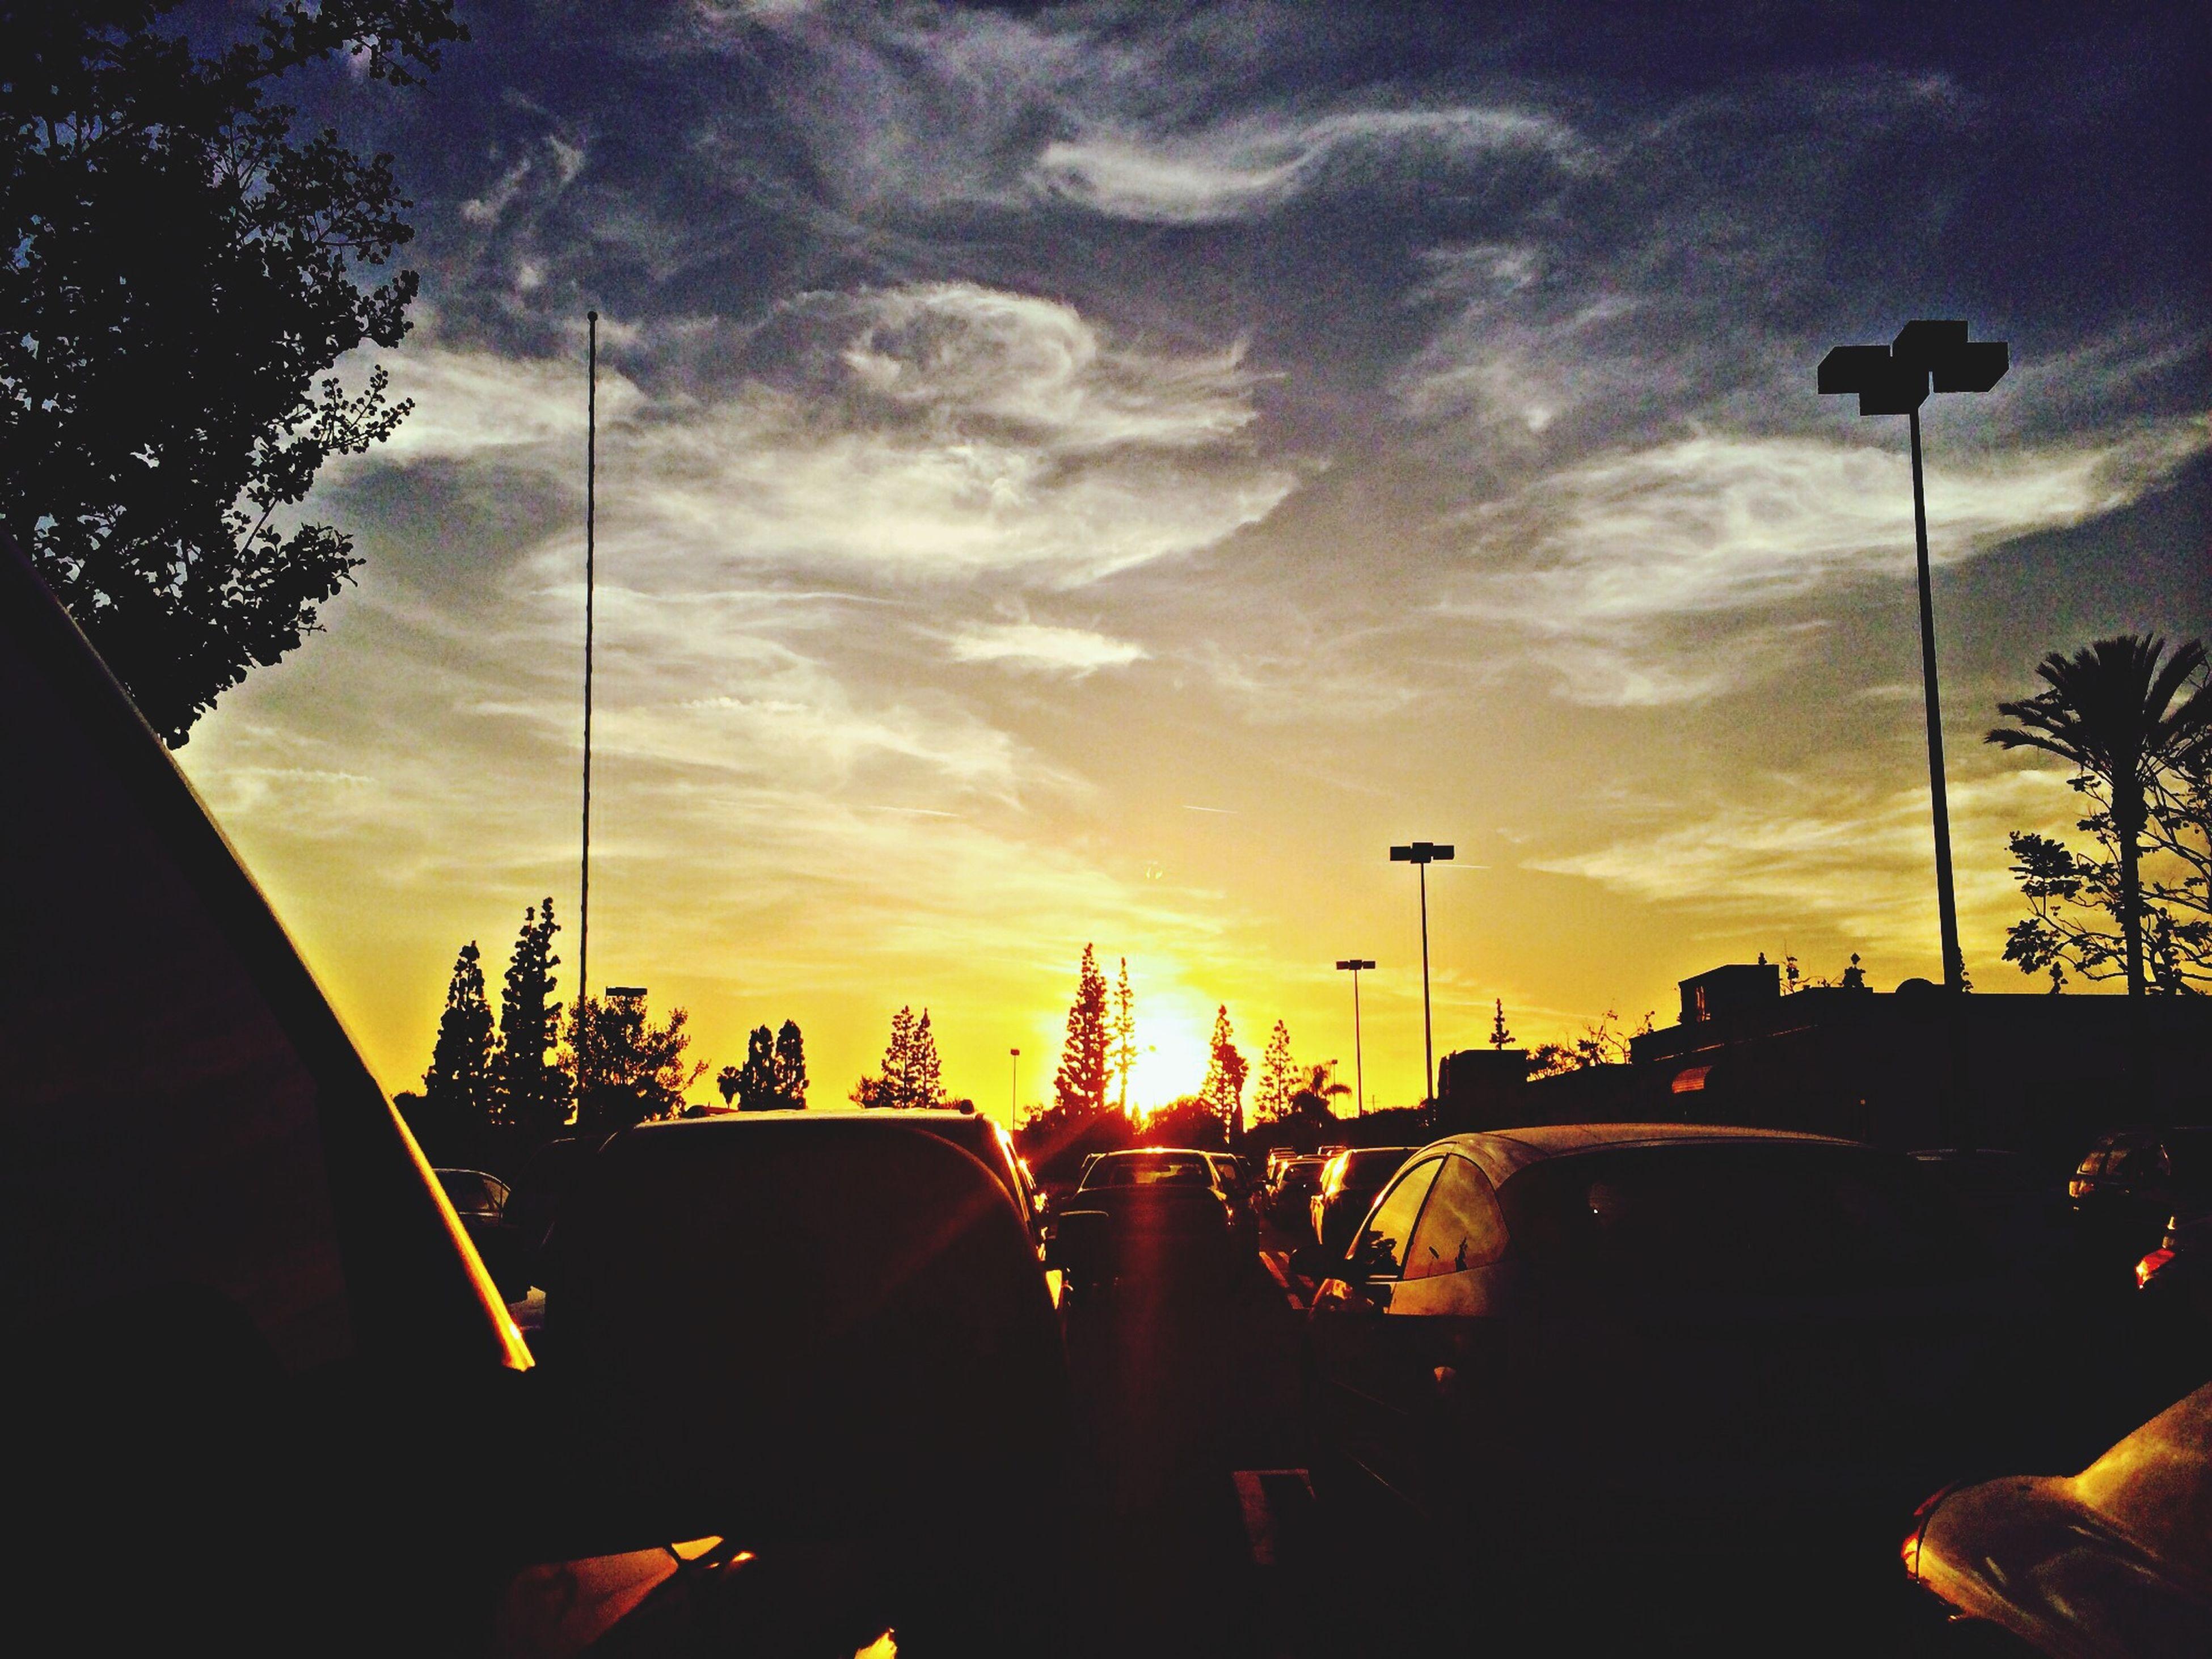 transportation, car, land vehicle, sunset, mode of transport, sky, street light, silhouette, road, street, tree, cloud - sky, traffic, orange color, illuminated, dusk, on the move, cloud, outdoors, travel